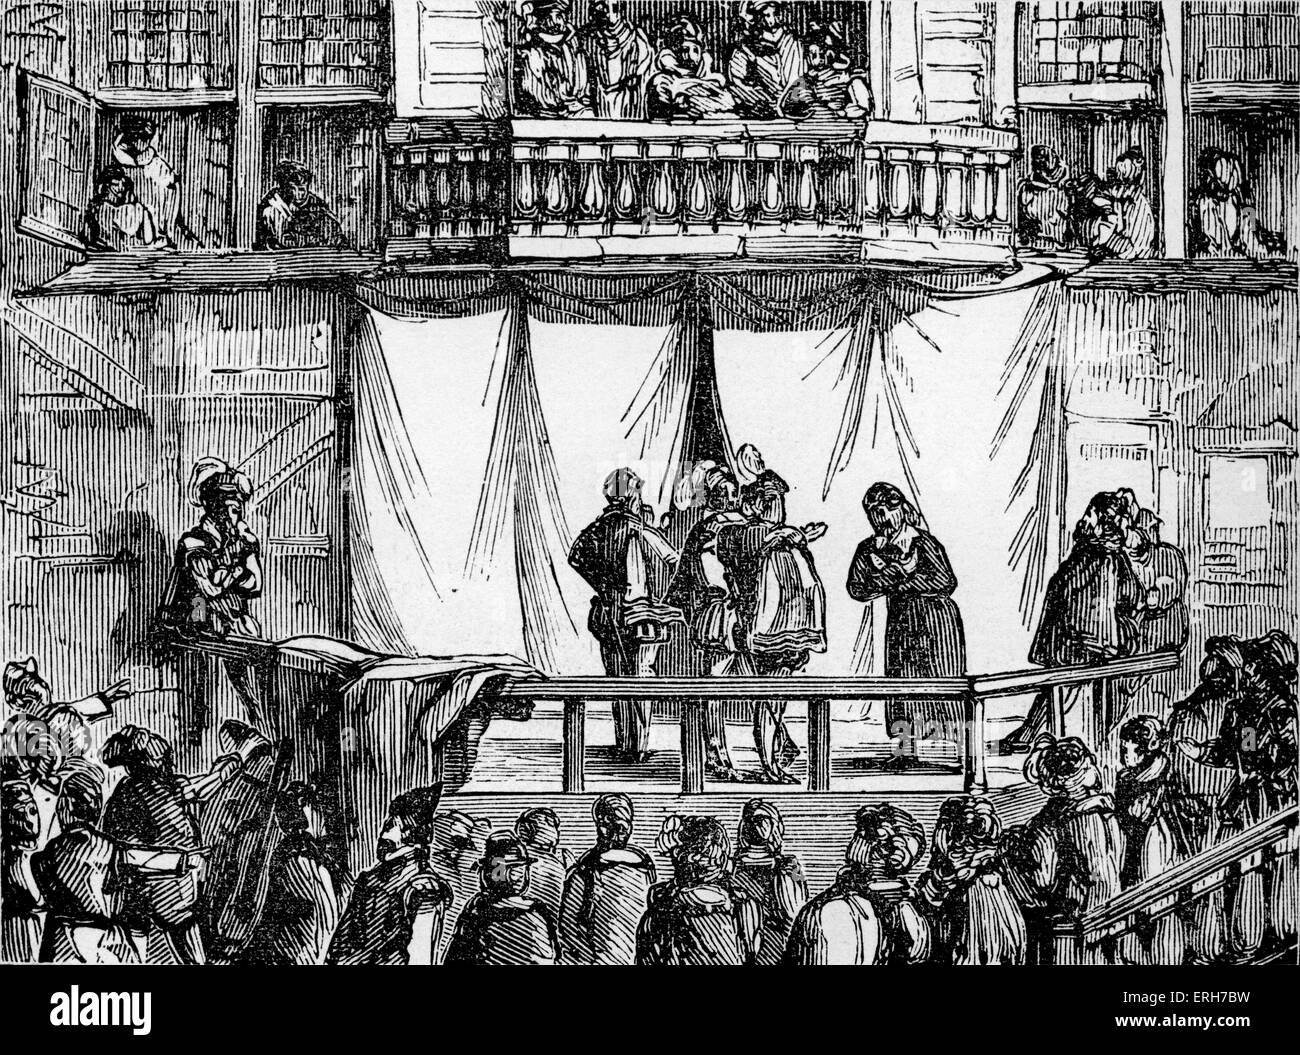 Early History British